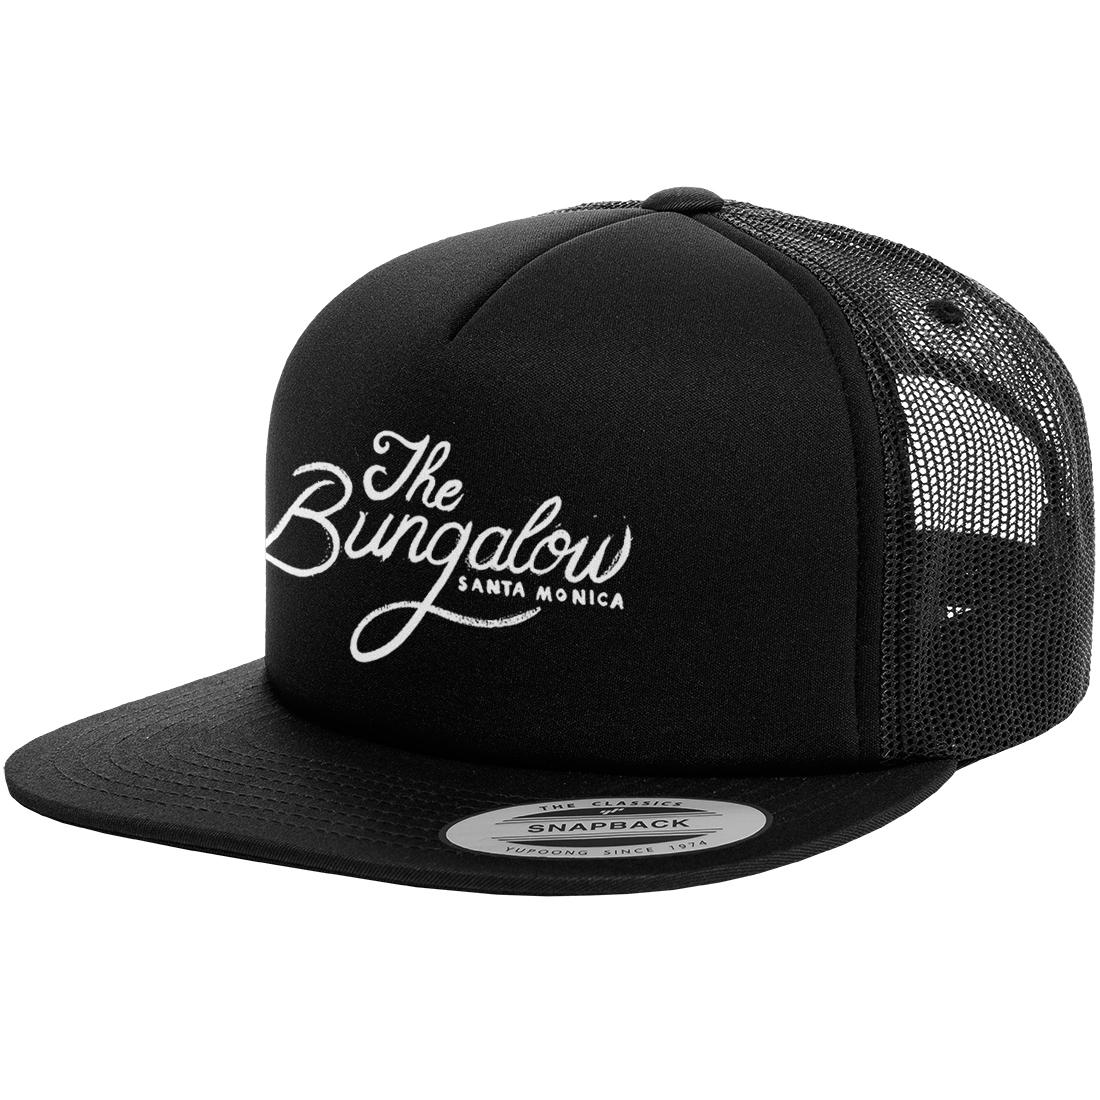 THE_BUNGALOW-HAT_MOCK-BLK.jpg